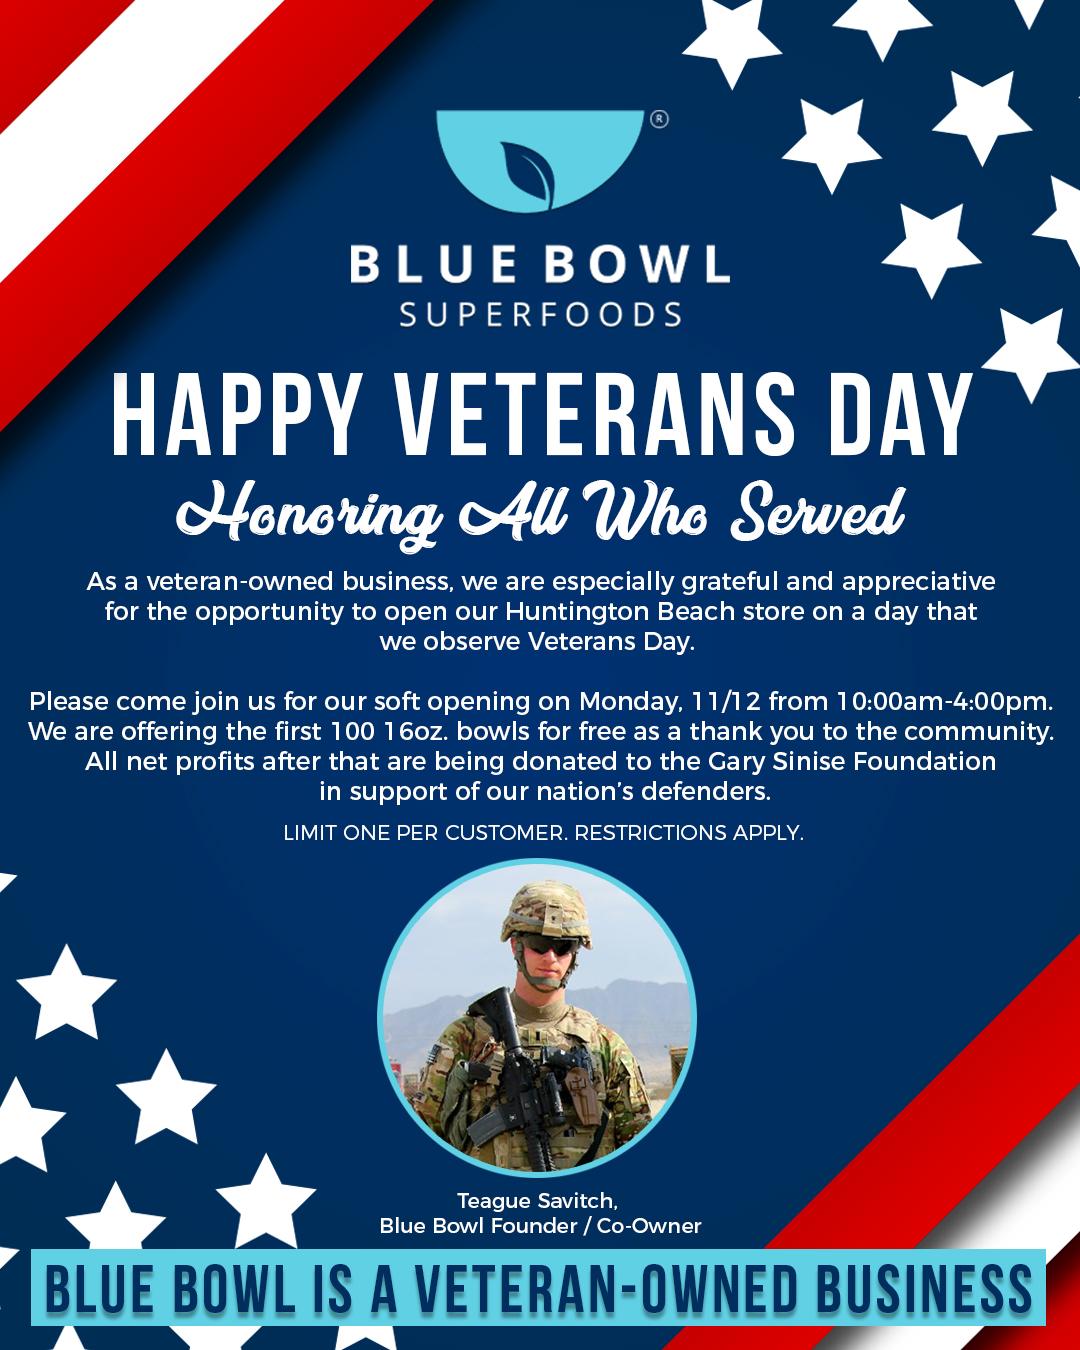 BlueBowl-IG-VeteransDay.jpg